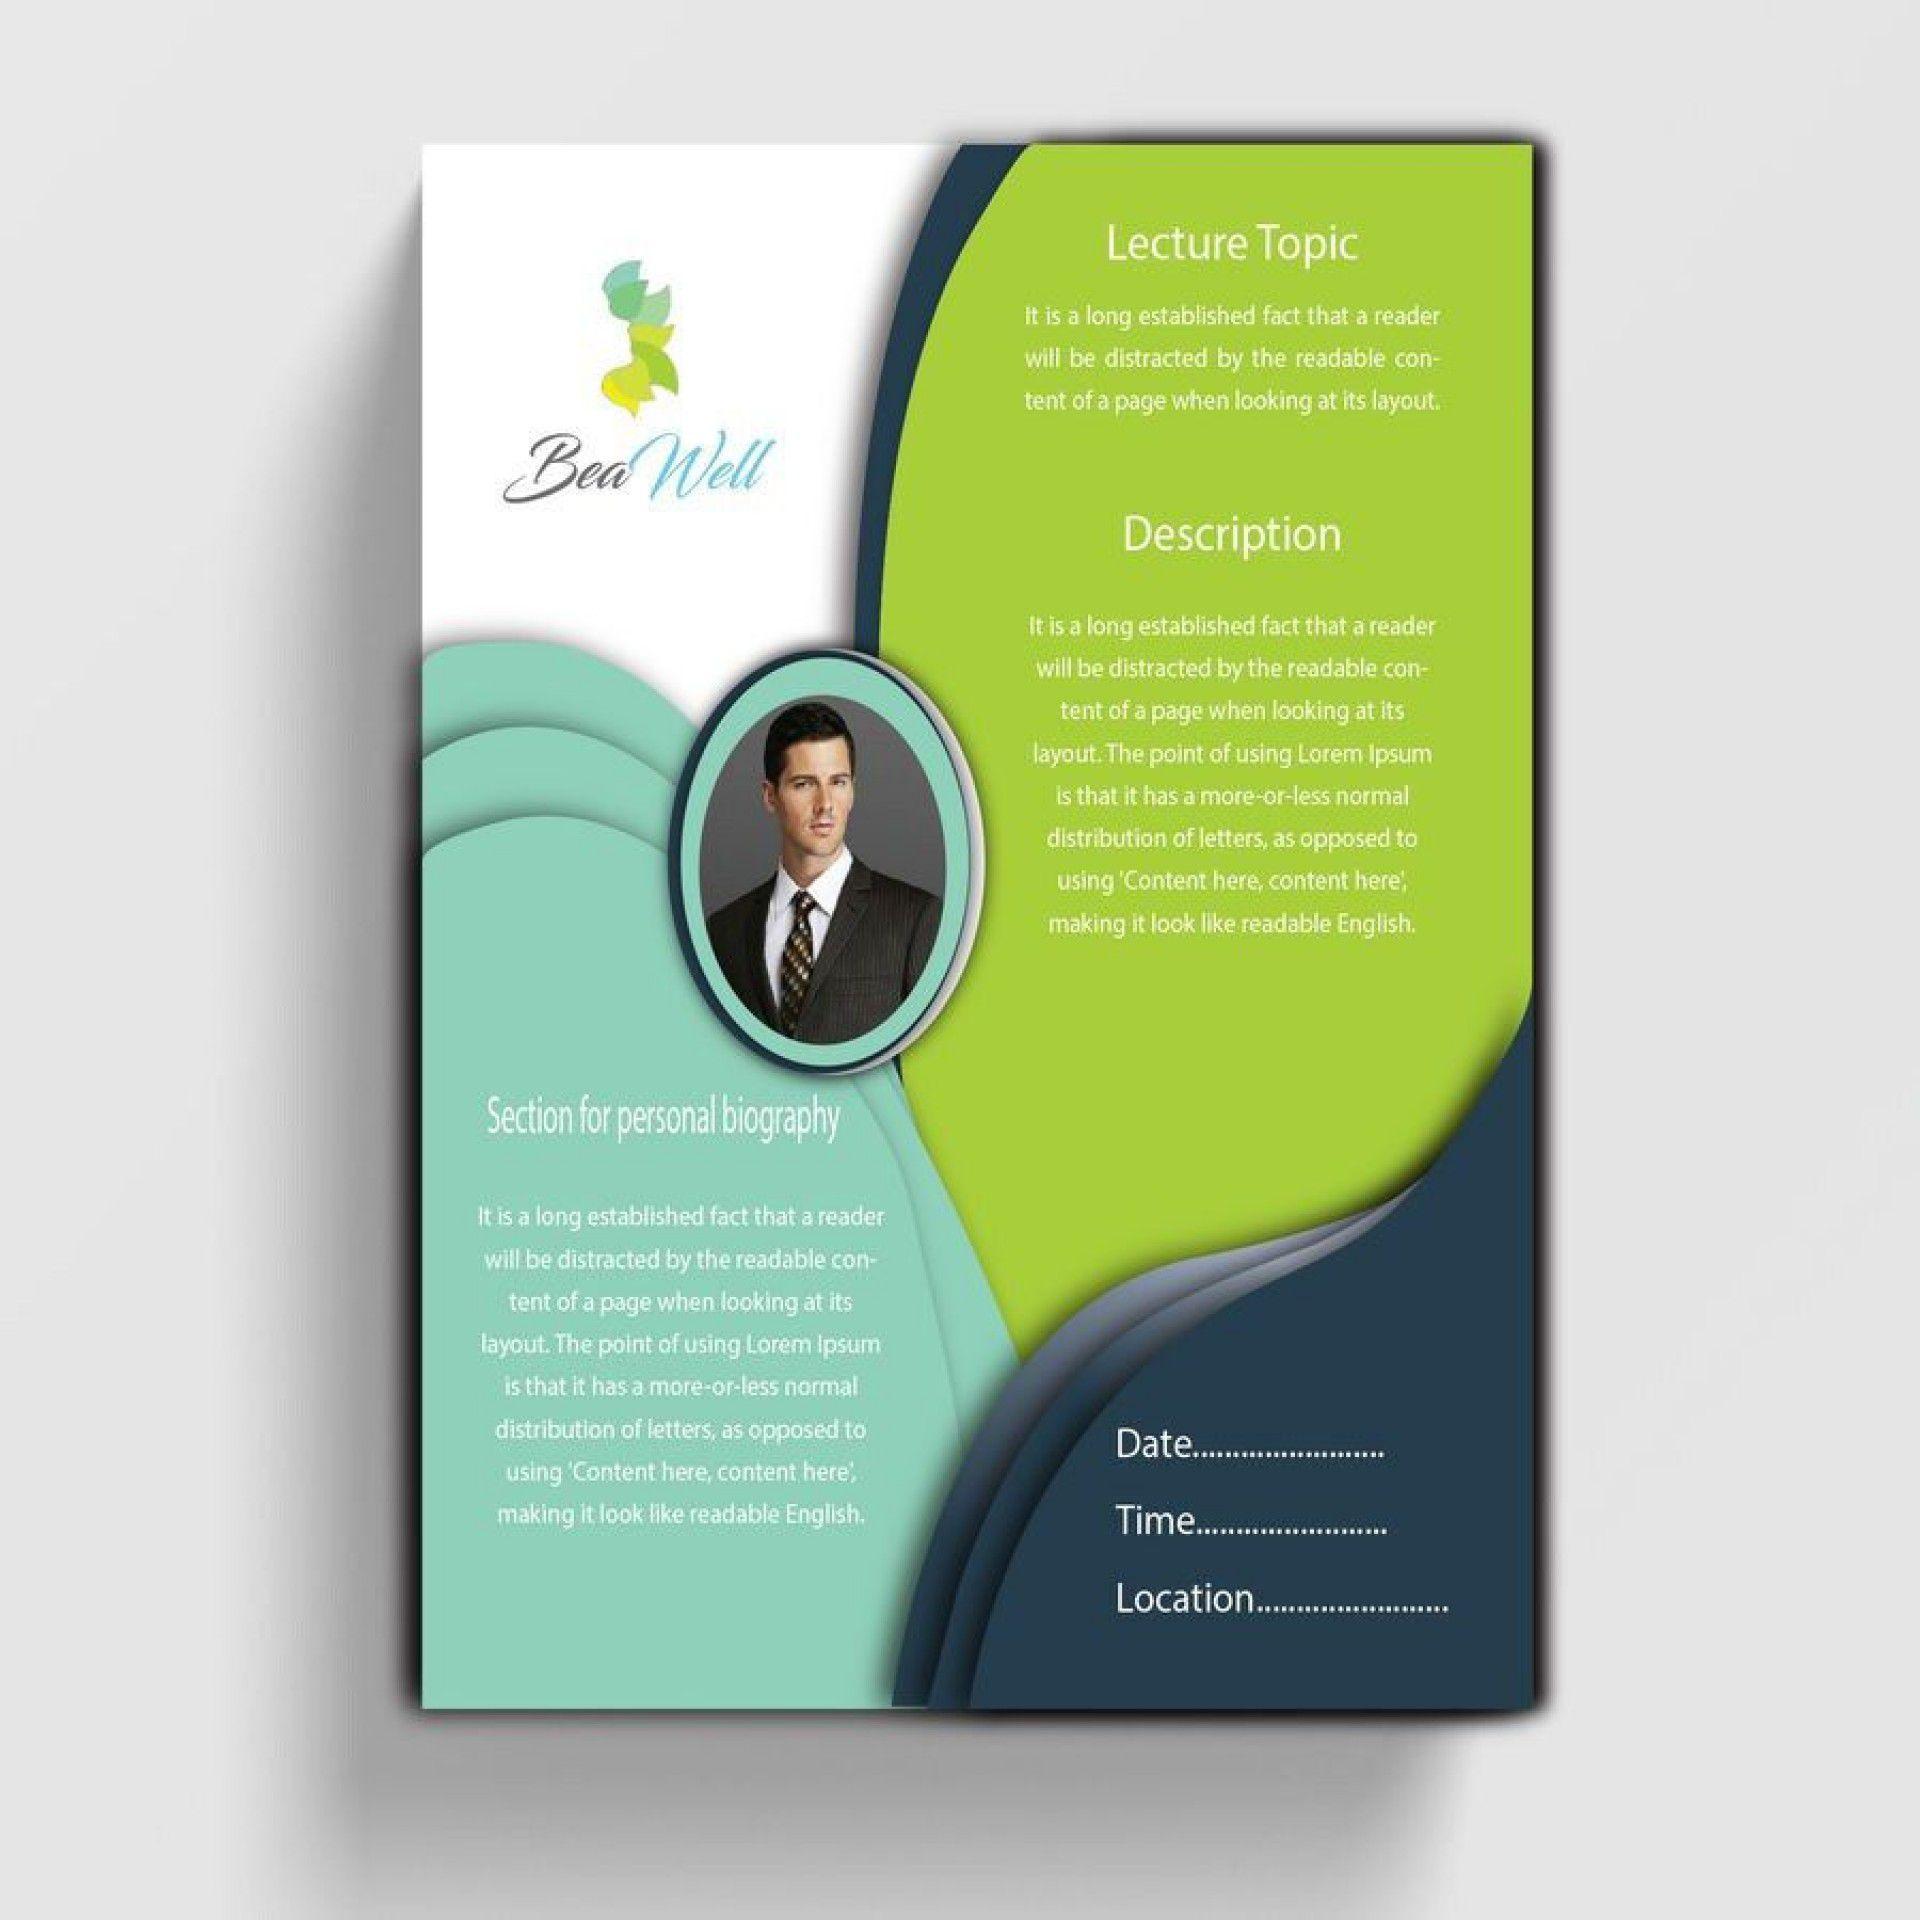 001 Amazing Microsoft Publisher Brochure Template Idea  Templates Tri Fold Free Office DownloadFull